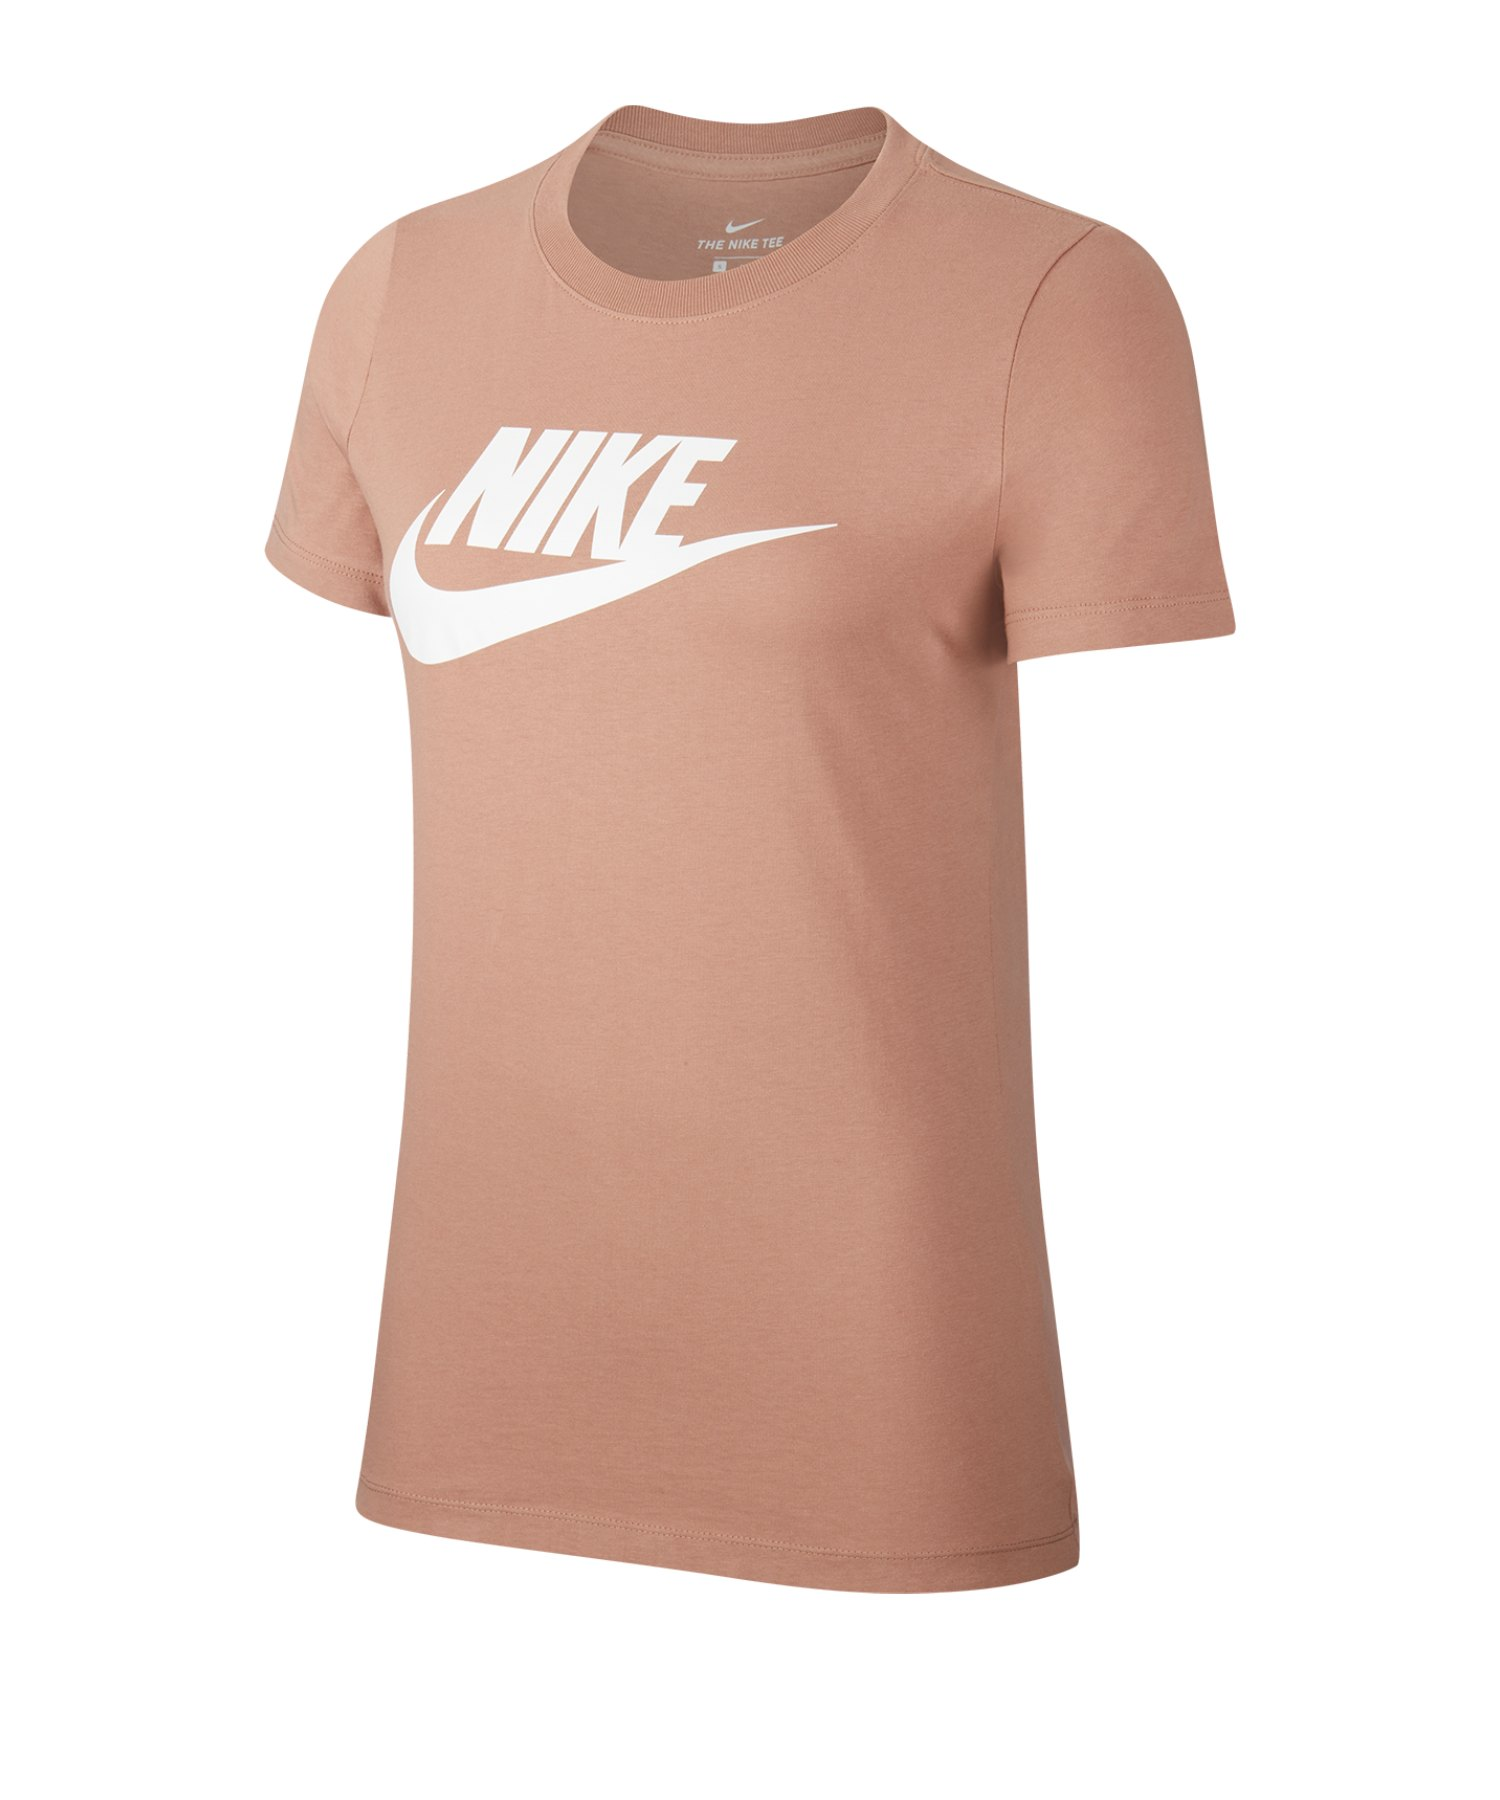 Nike Essential Tee T-Shirt Damen Braun F283 - braun